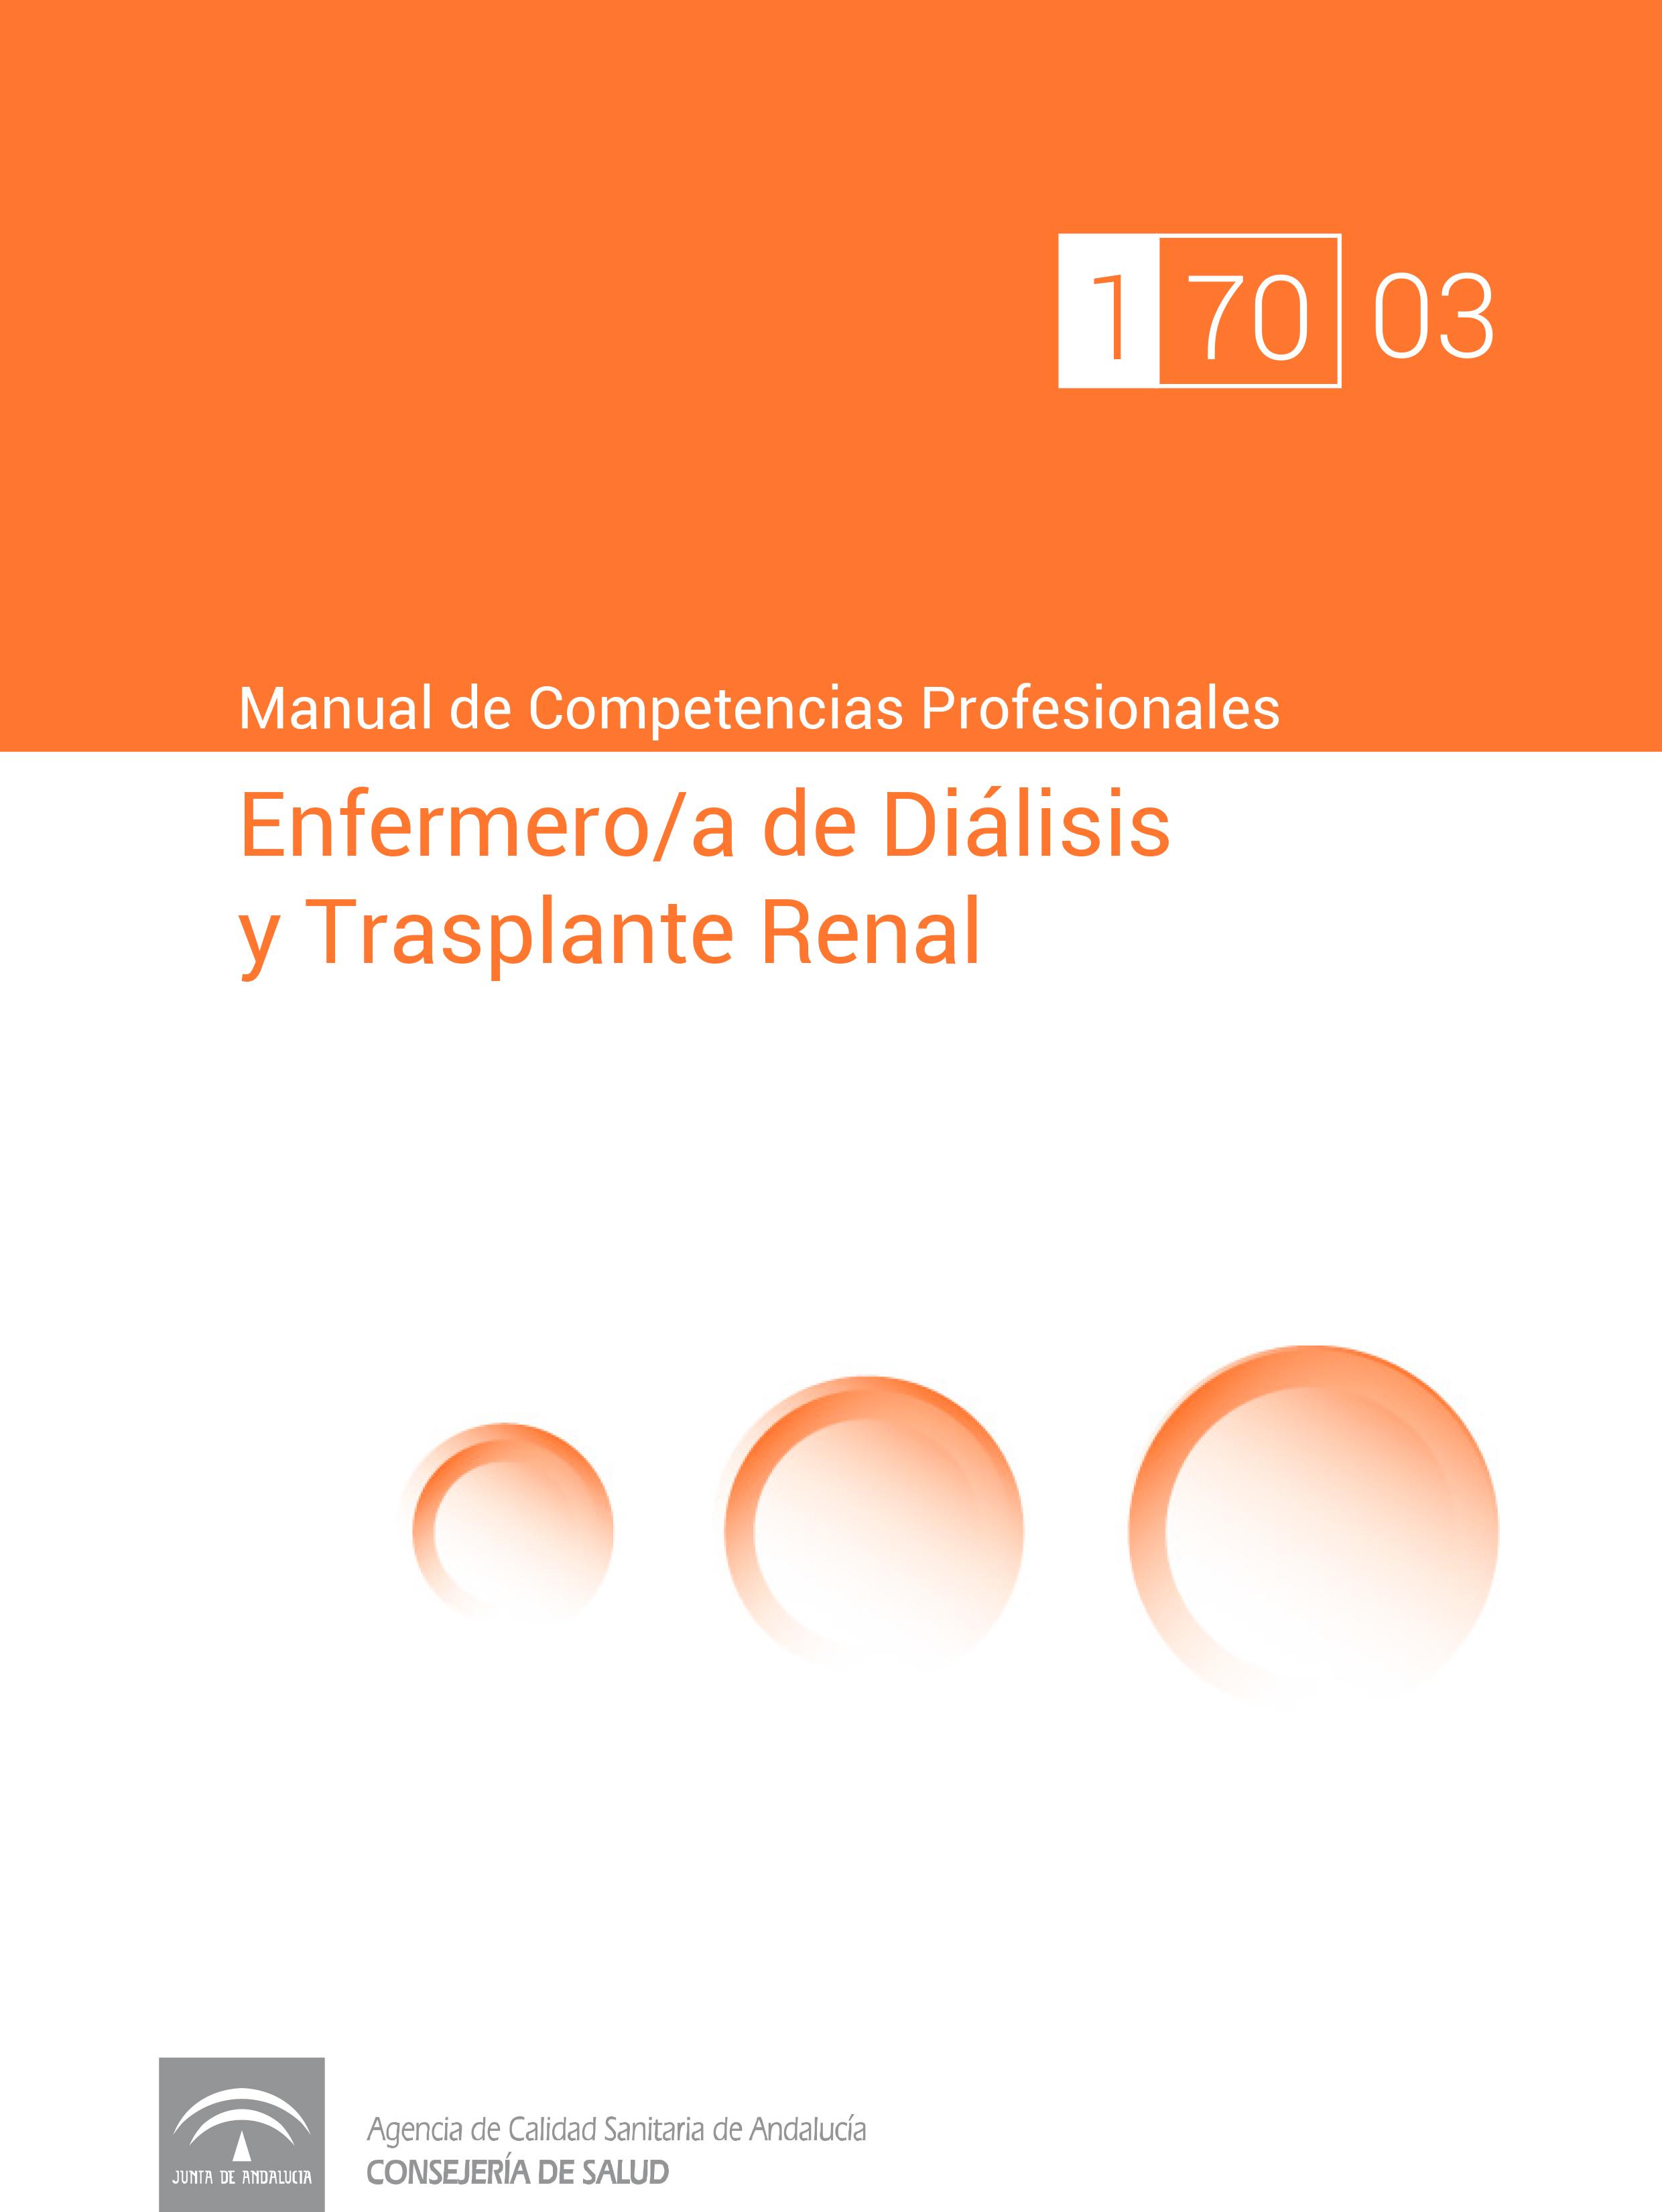 Renal Dialysis and Transplant Nurse